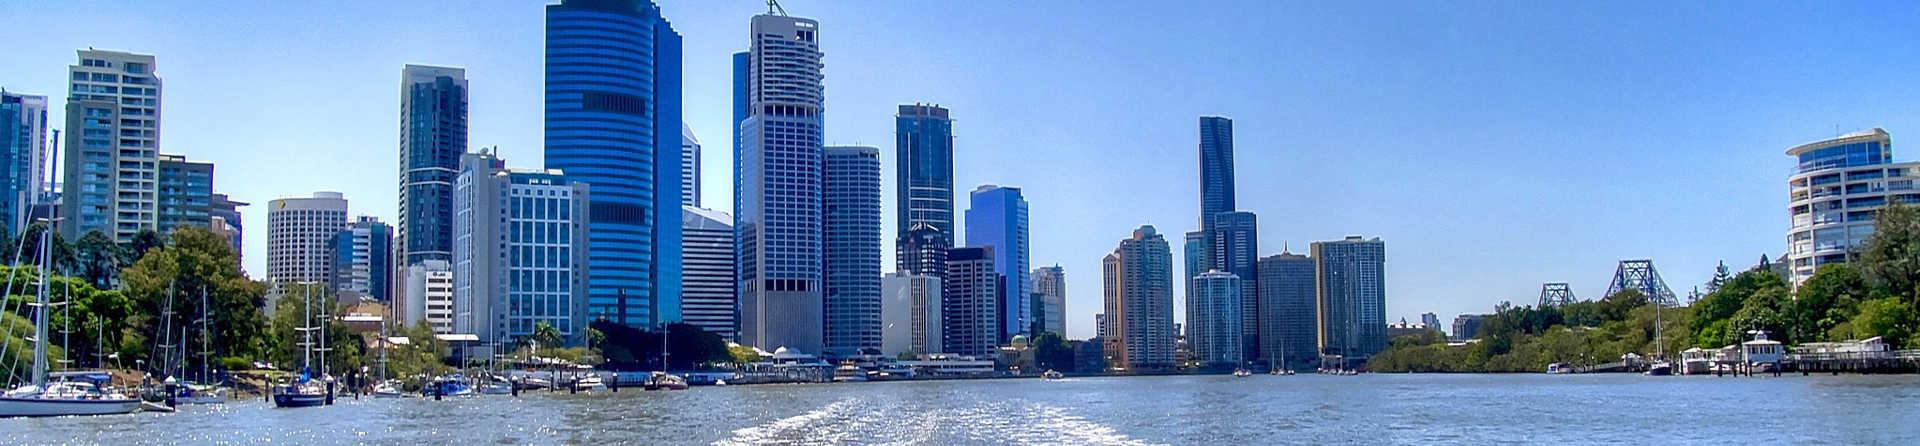 Does Brisbane have 4 seasons?